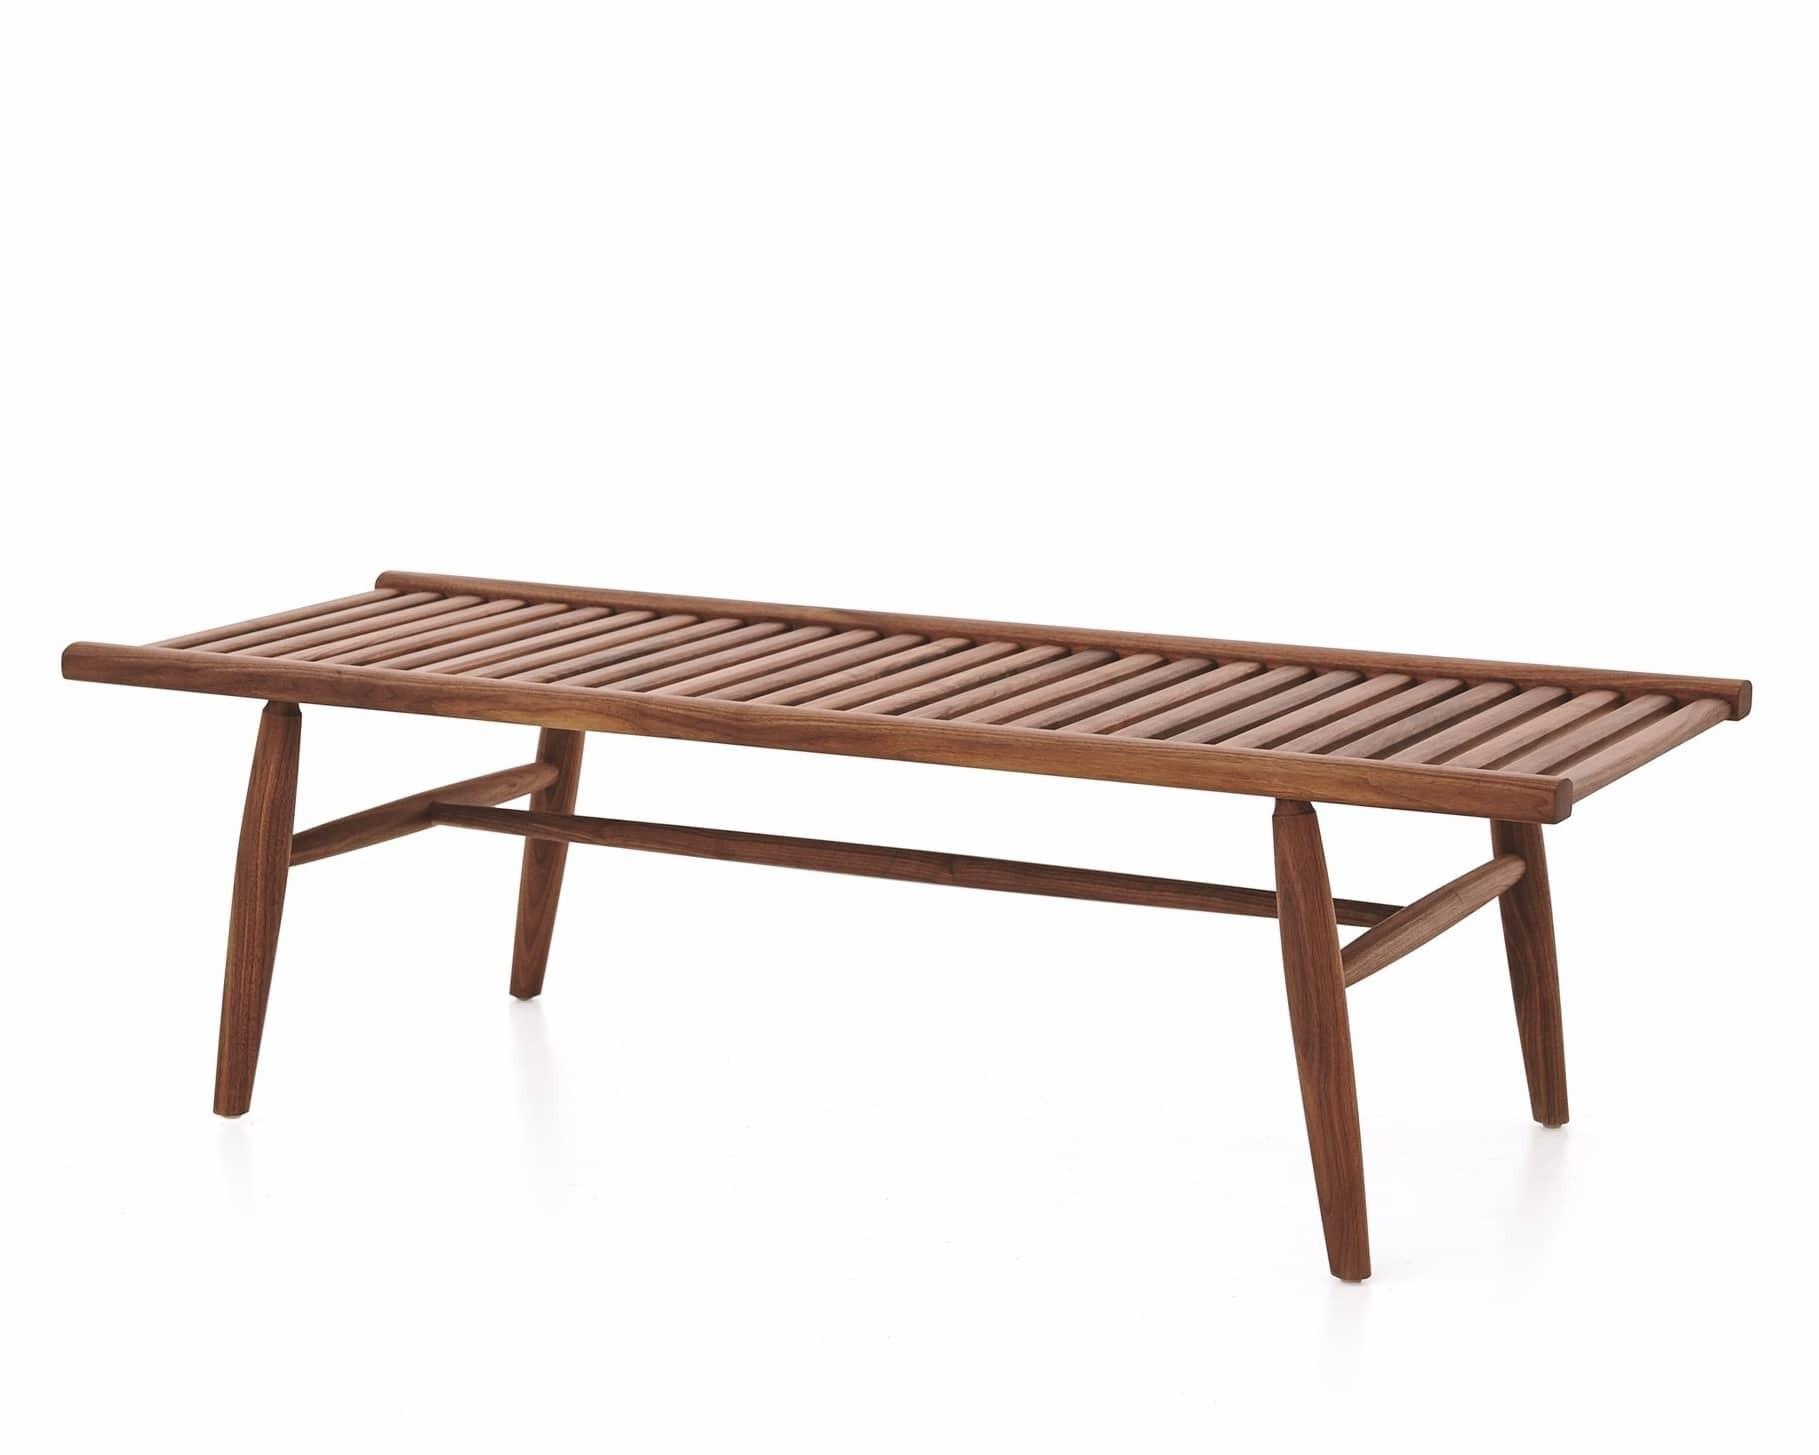 Wohlert Long Bench